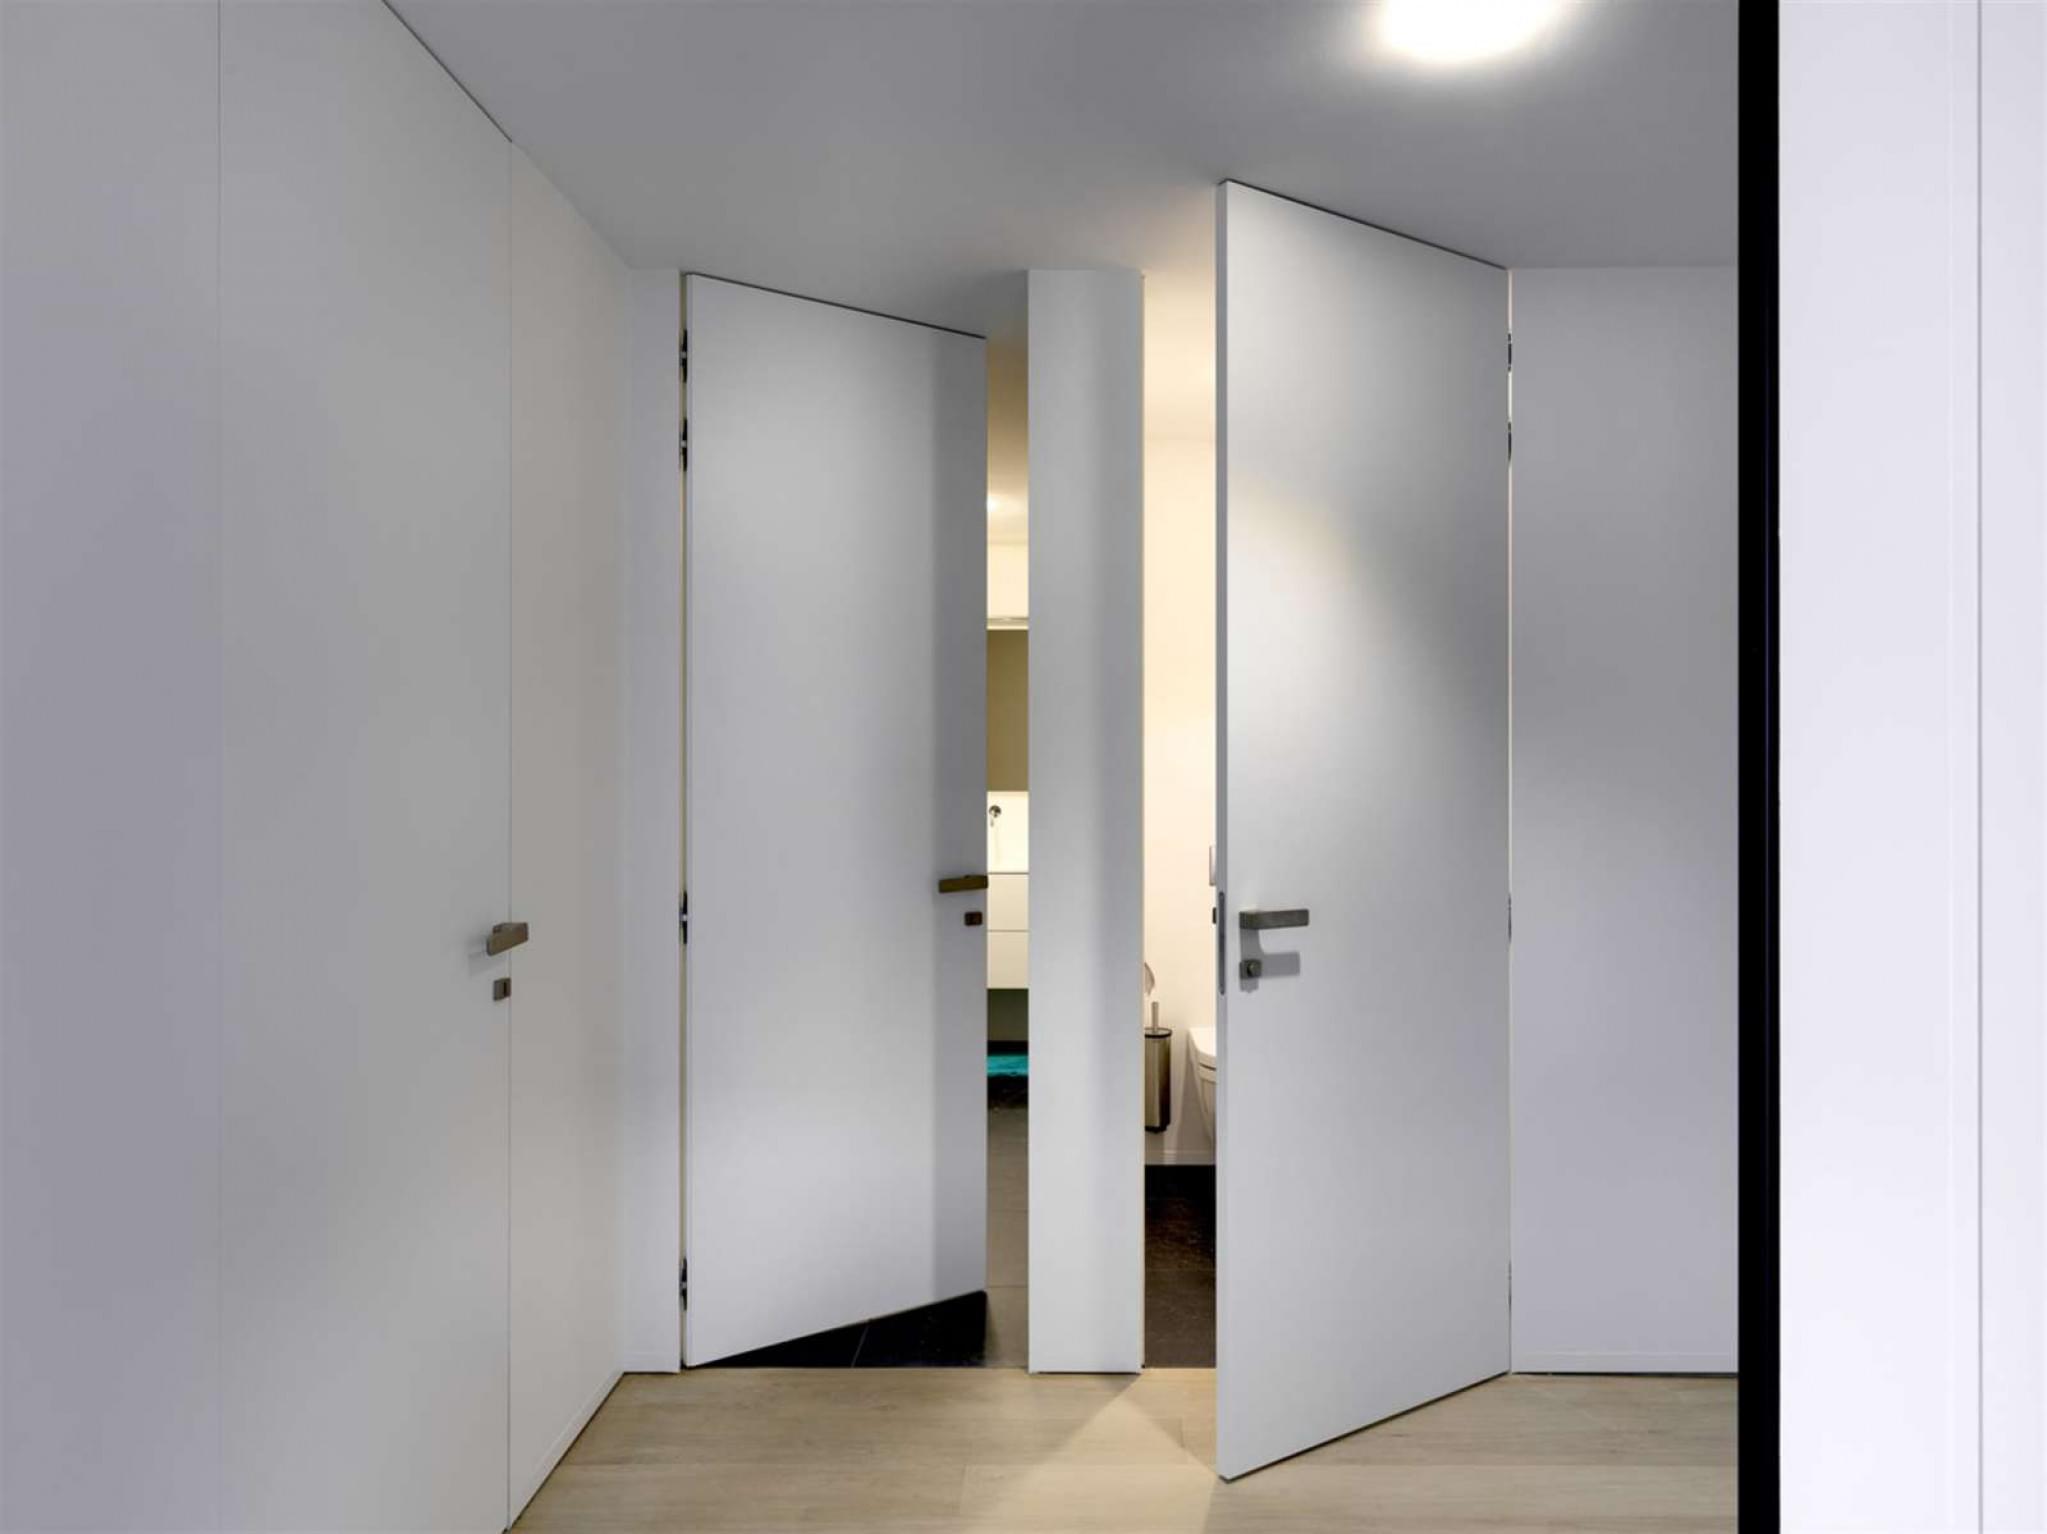 plafondhoge-WC-deur-strak-interieur